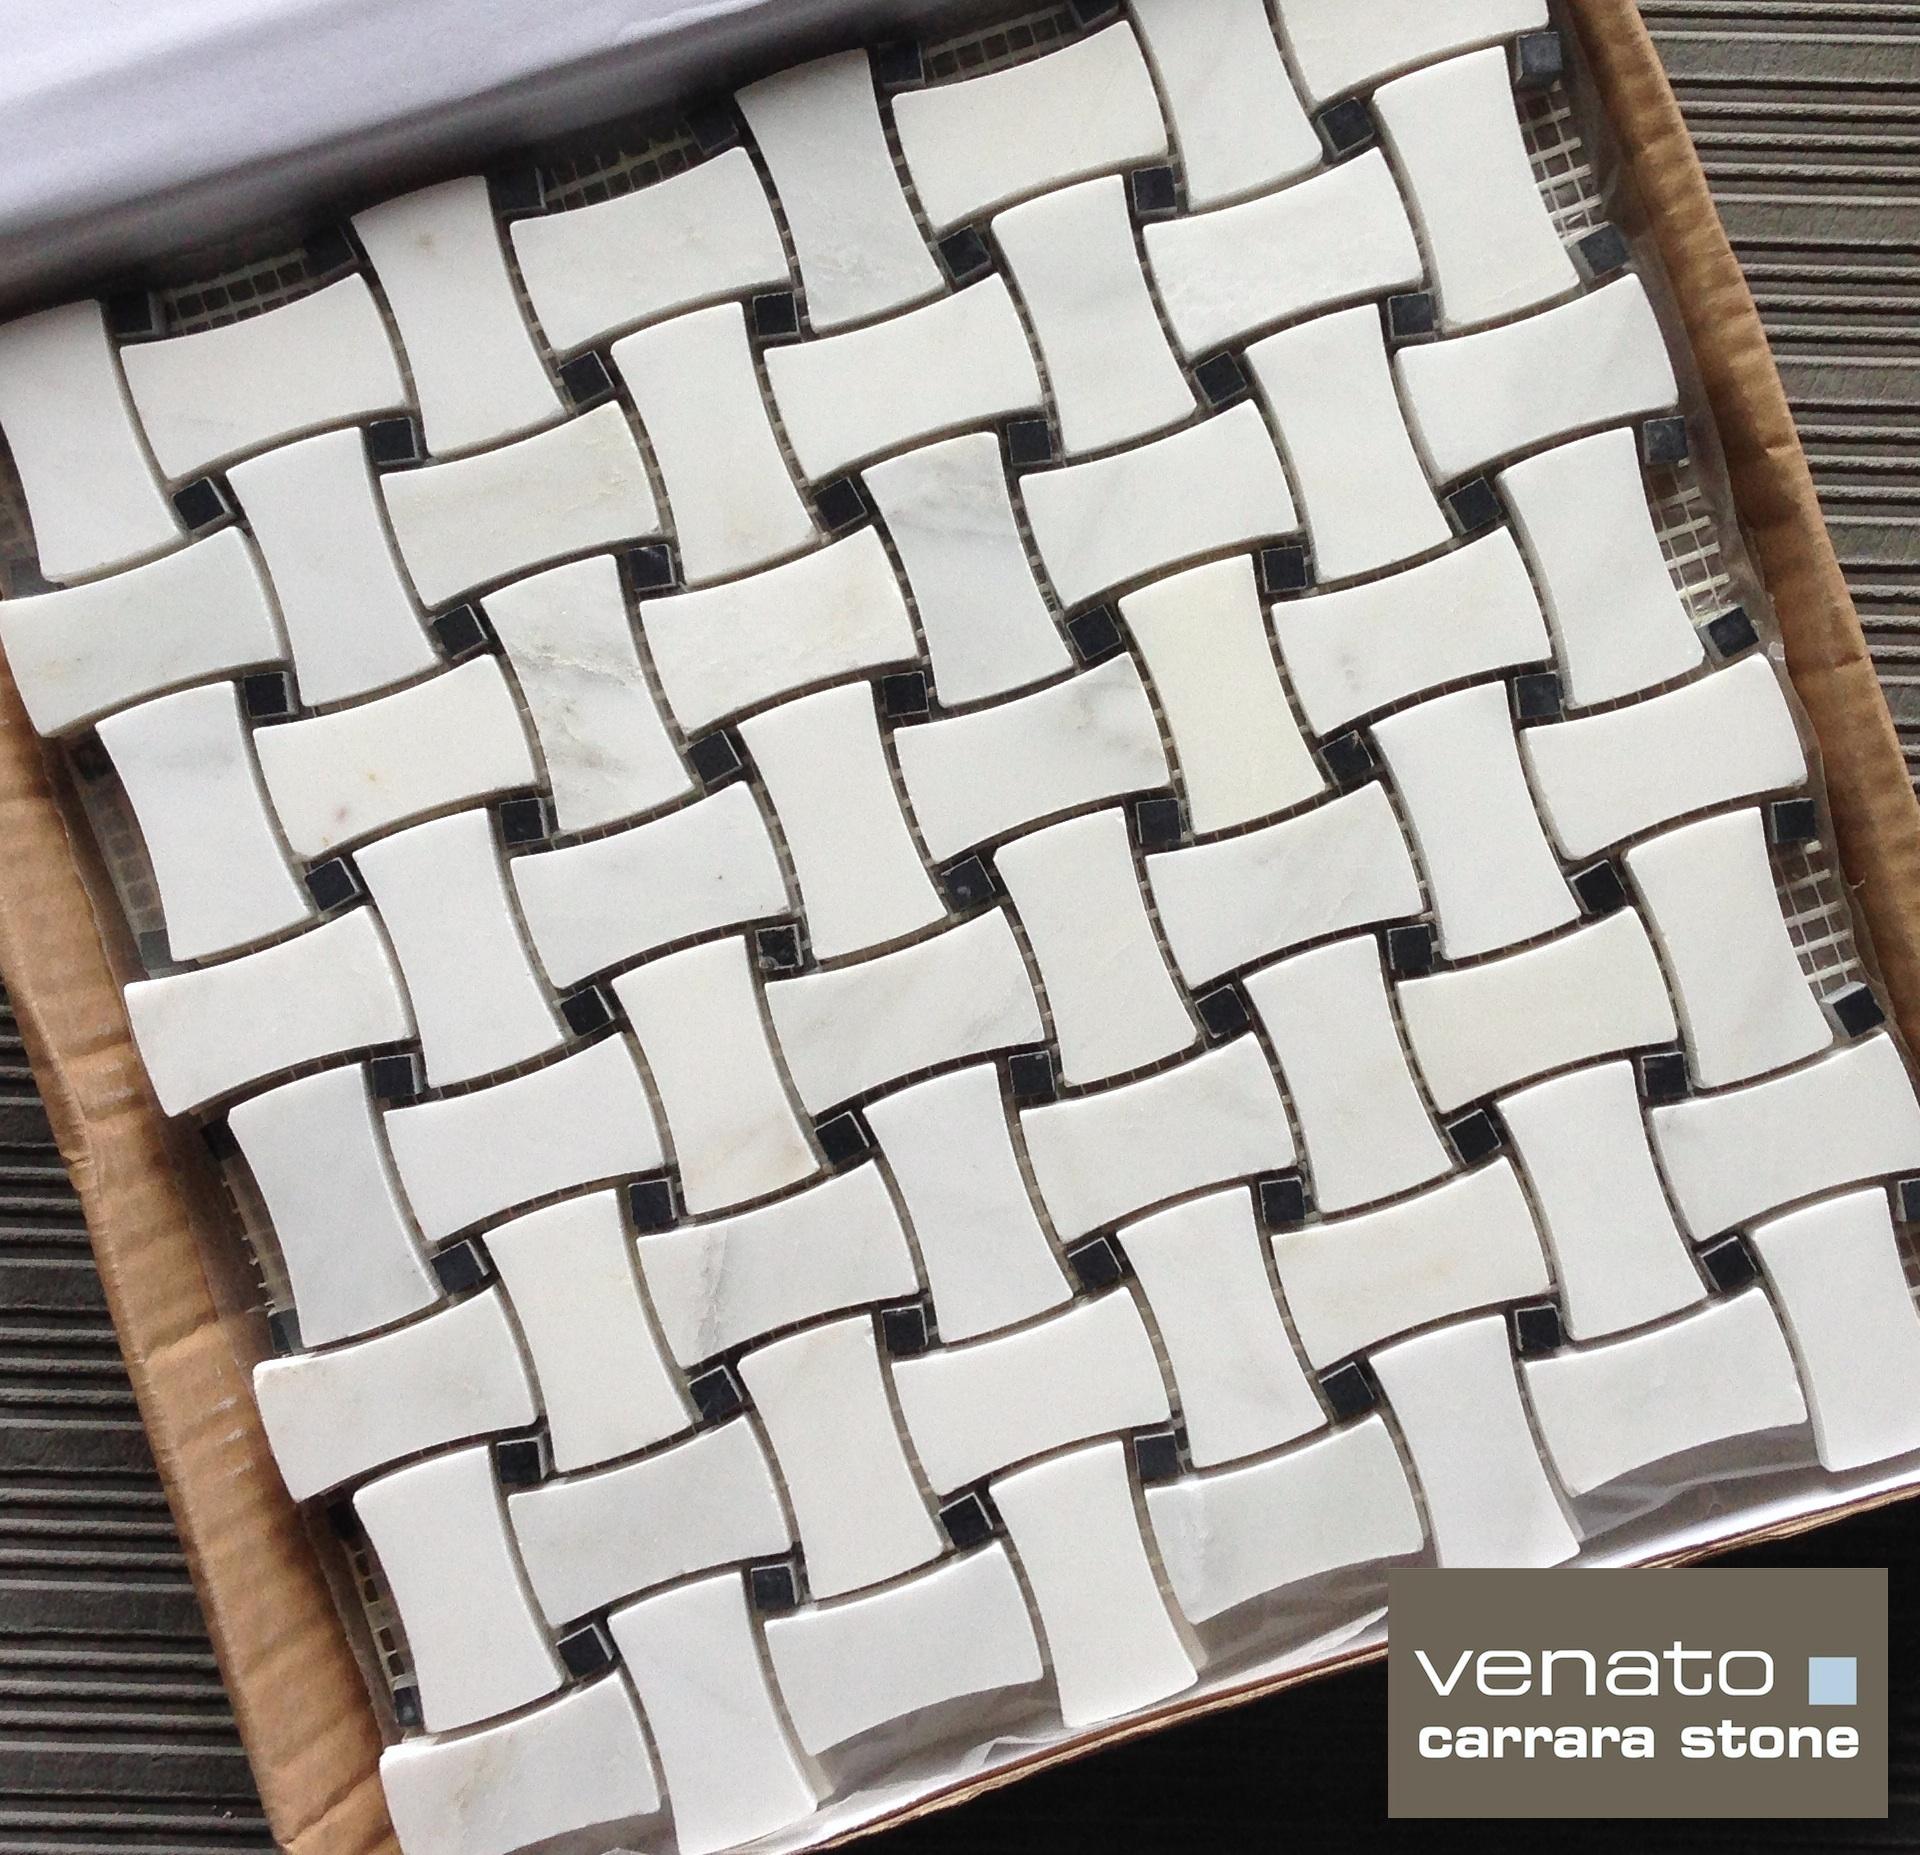 Marble Basketweave Tile >> Carrara Venato DogBone Basketweave   the builder depot blog